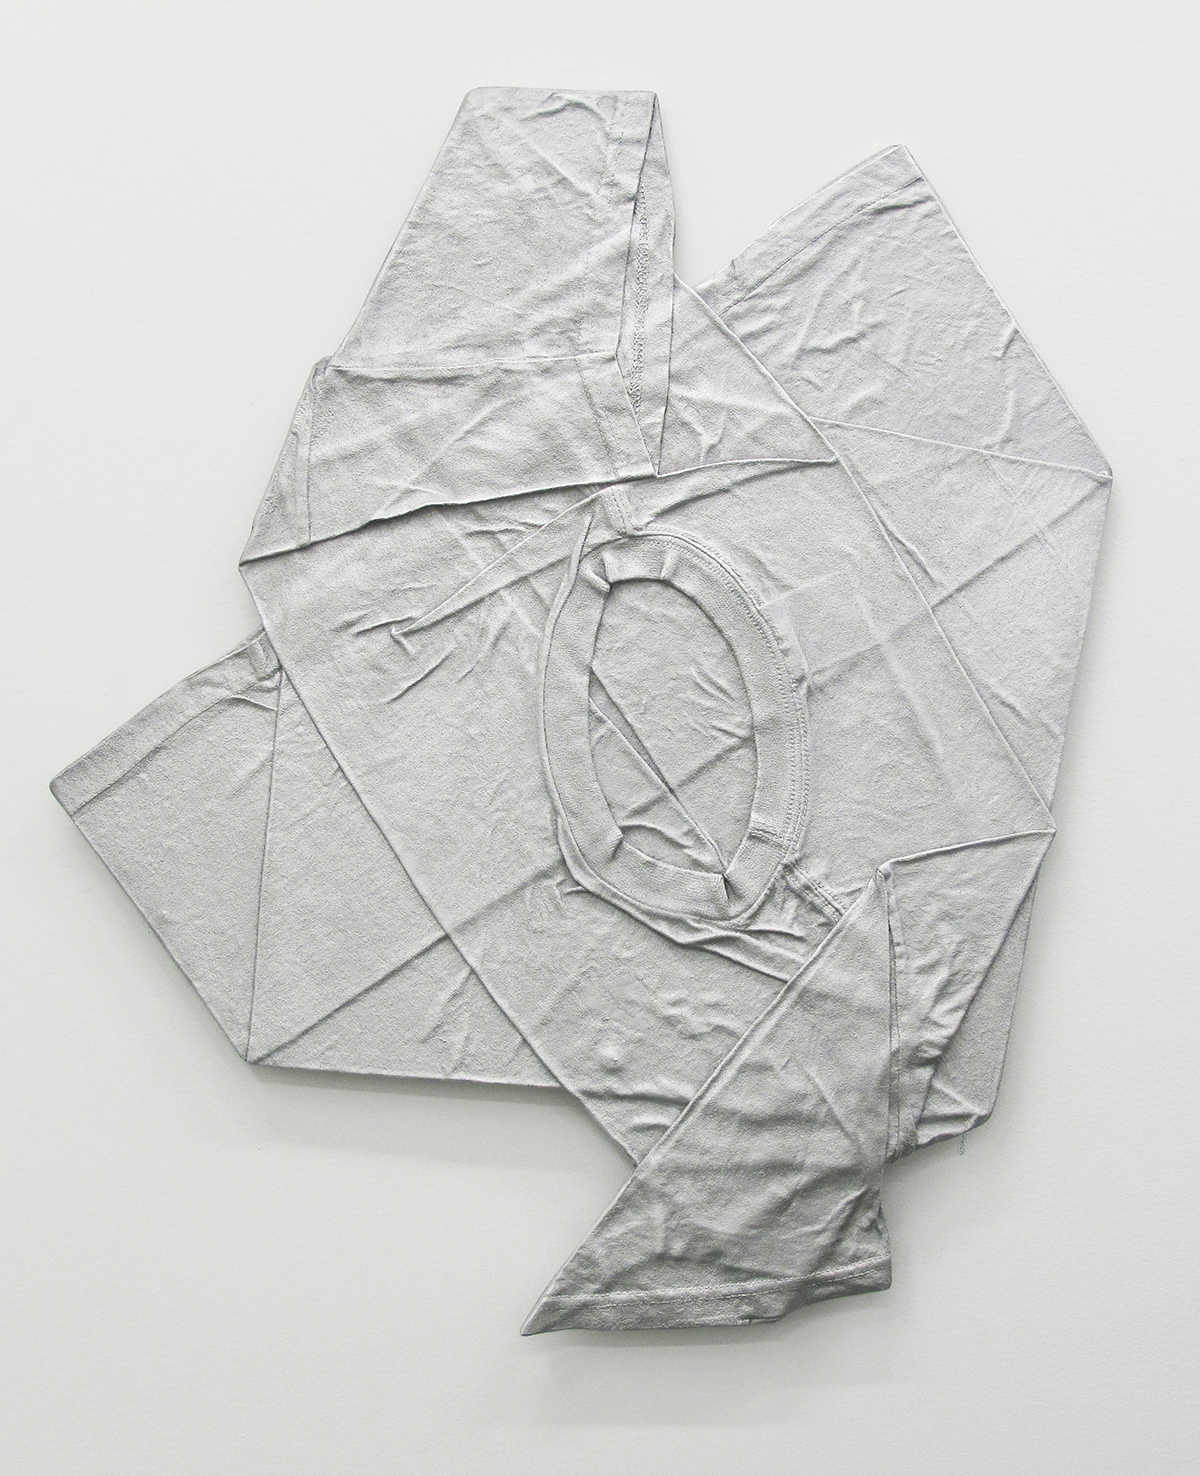 A.K. Burns, Discard, Shirt,